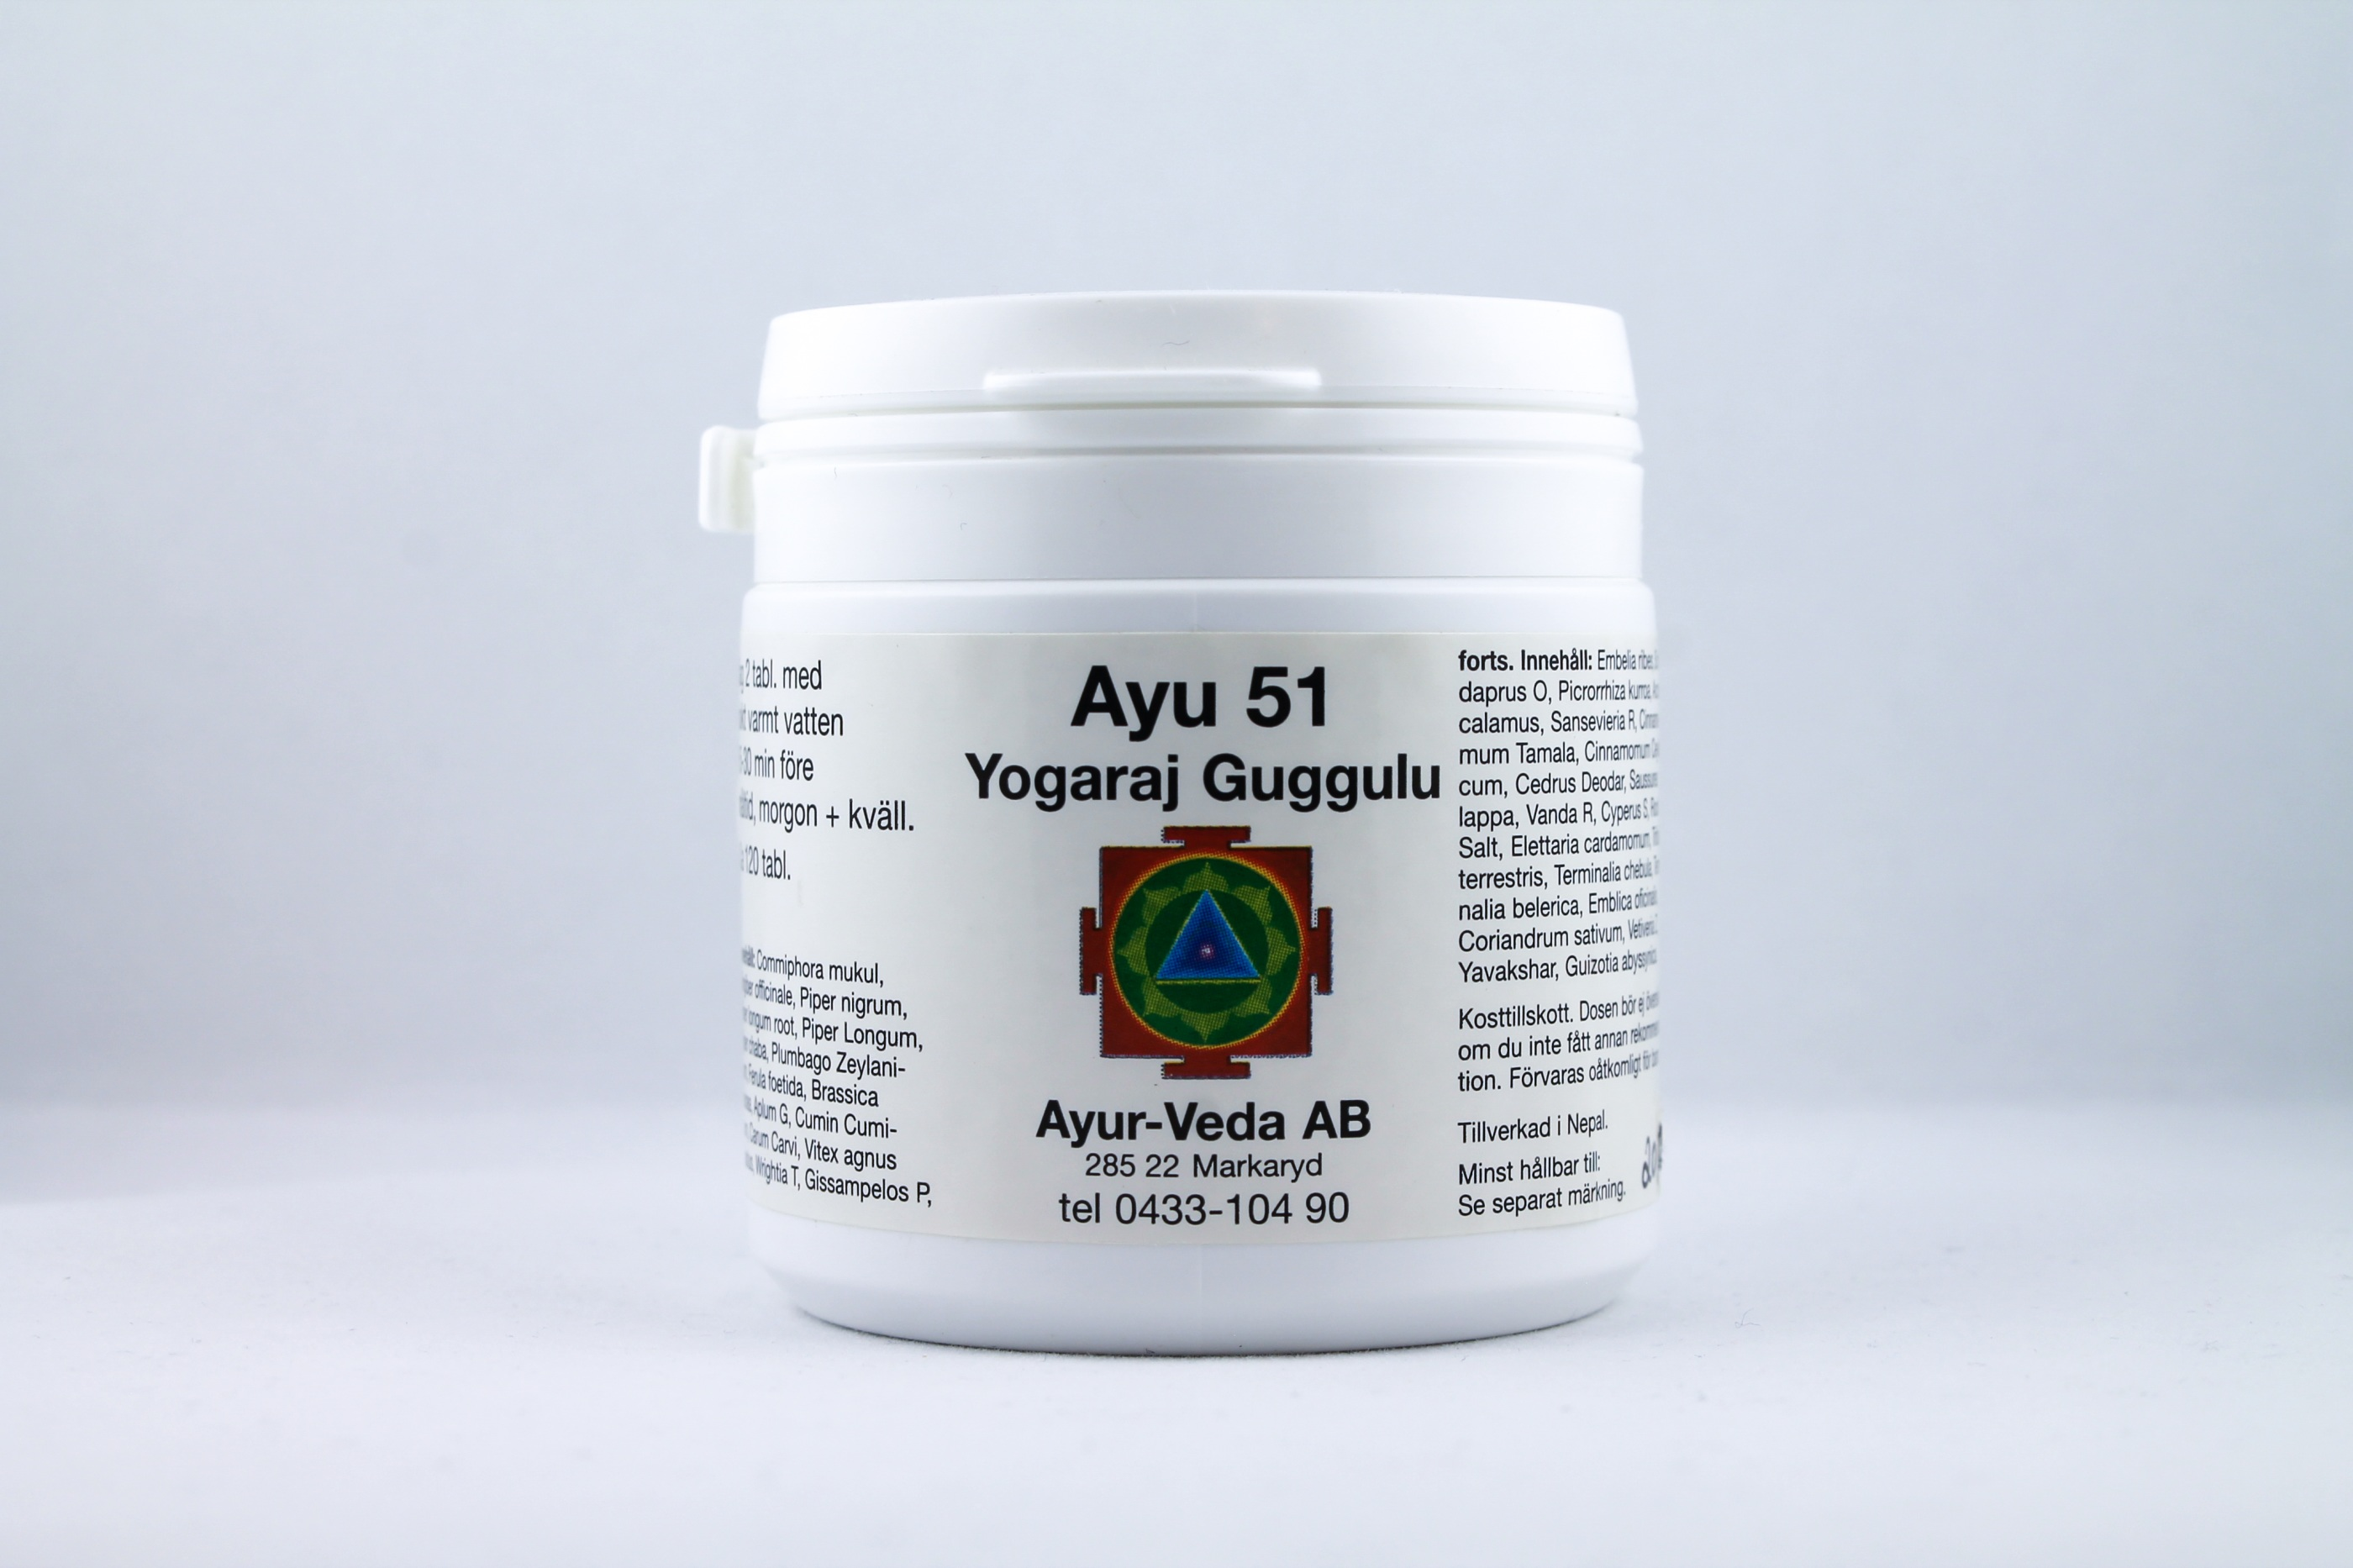 Yogaraj Guggulu Wellness Ayurveda Halmstadmassören Halmstad Sverige Sweden svensk tabletter